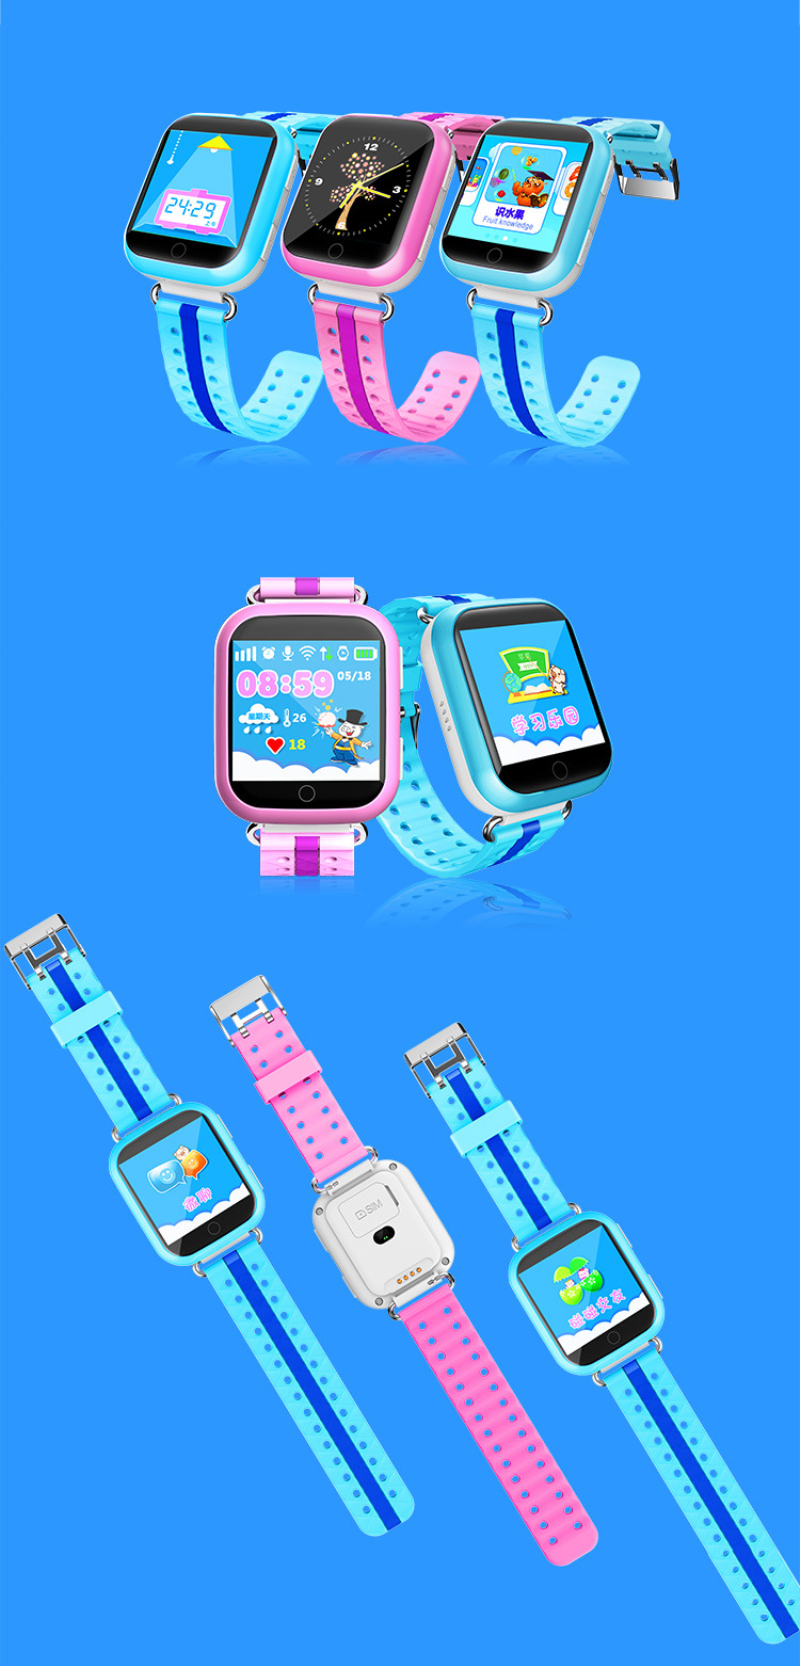 Smart Watch Phone for Children Electronic Toy Walkie Talkies Call GPS Wifi SOS iOS Touch Screen Russian Language Educational Boy (2)